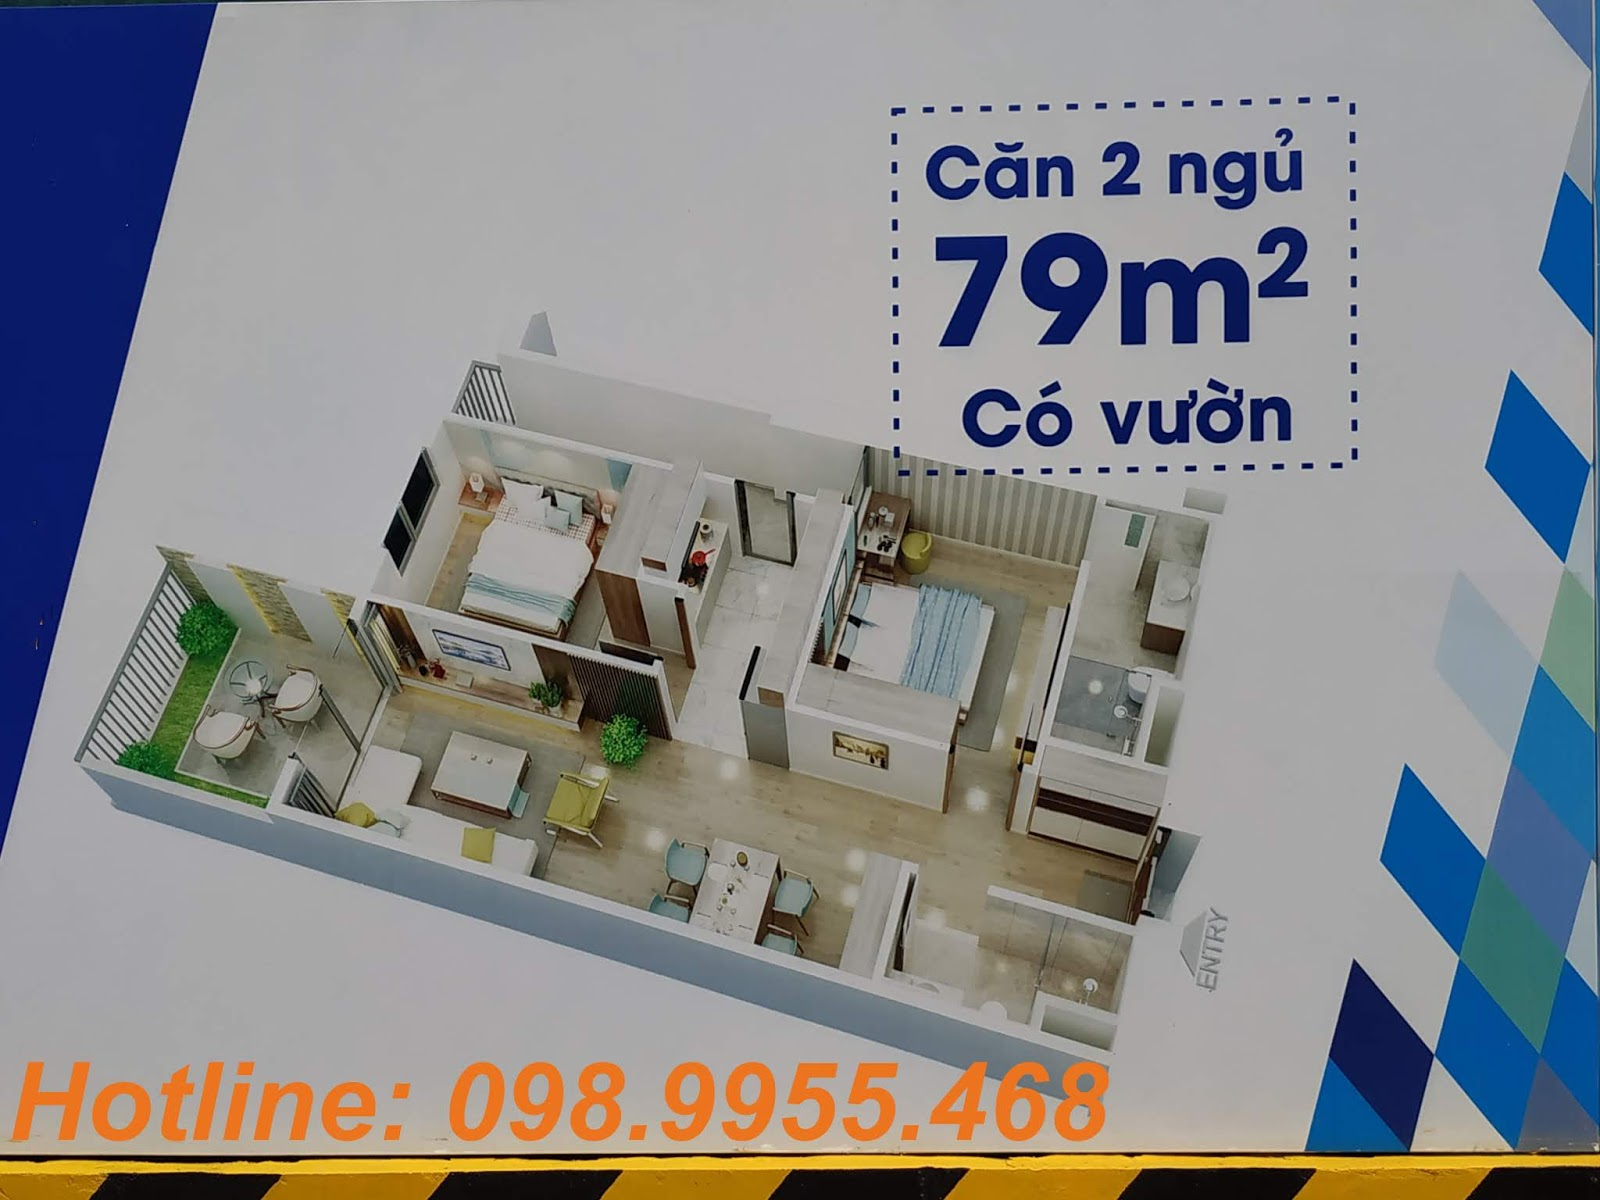 can-ho-2-phong-ngu-chung-cu-bid-residence